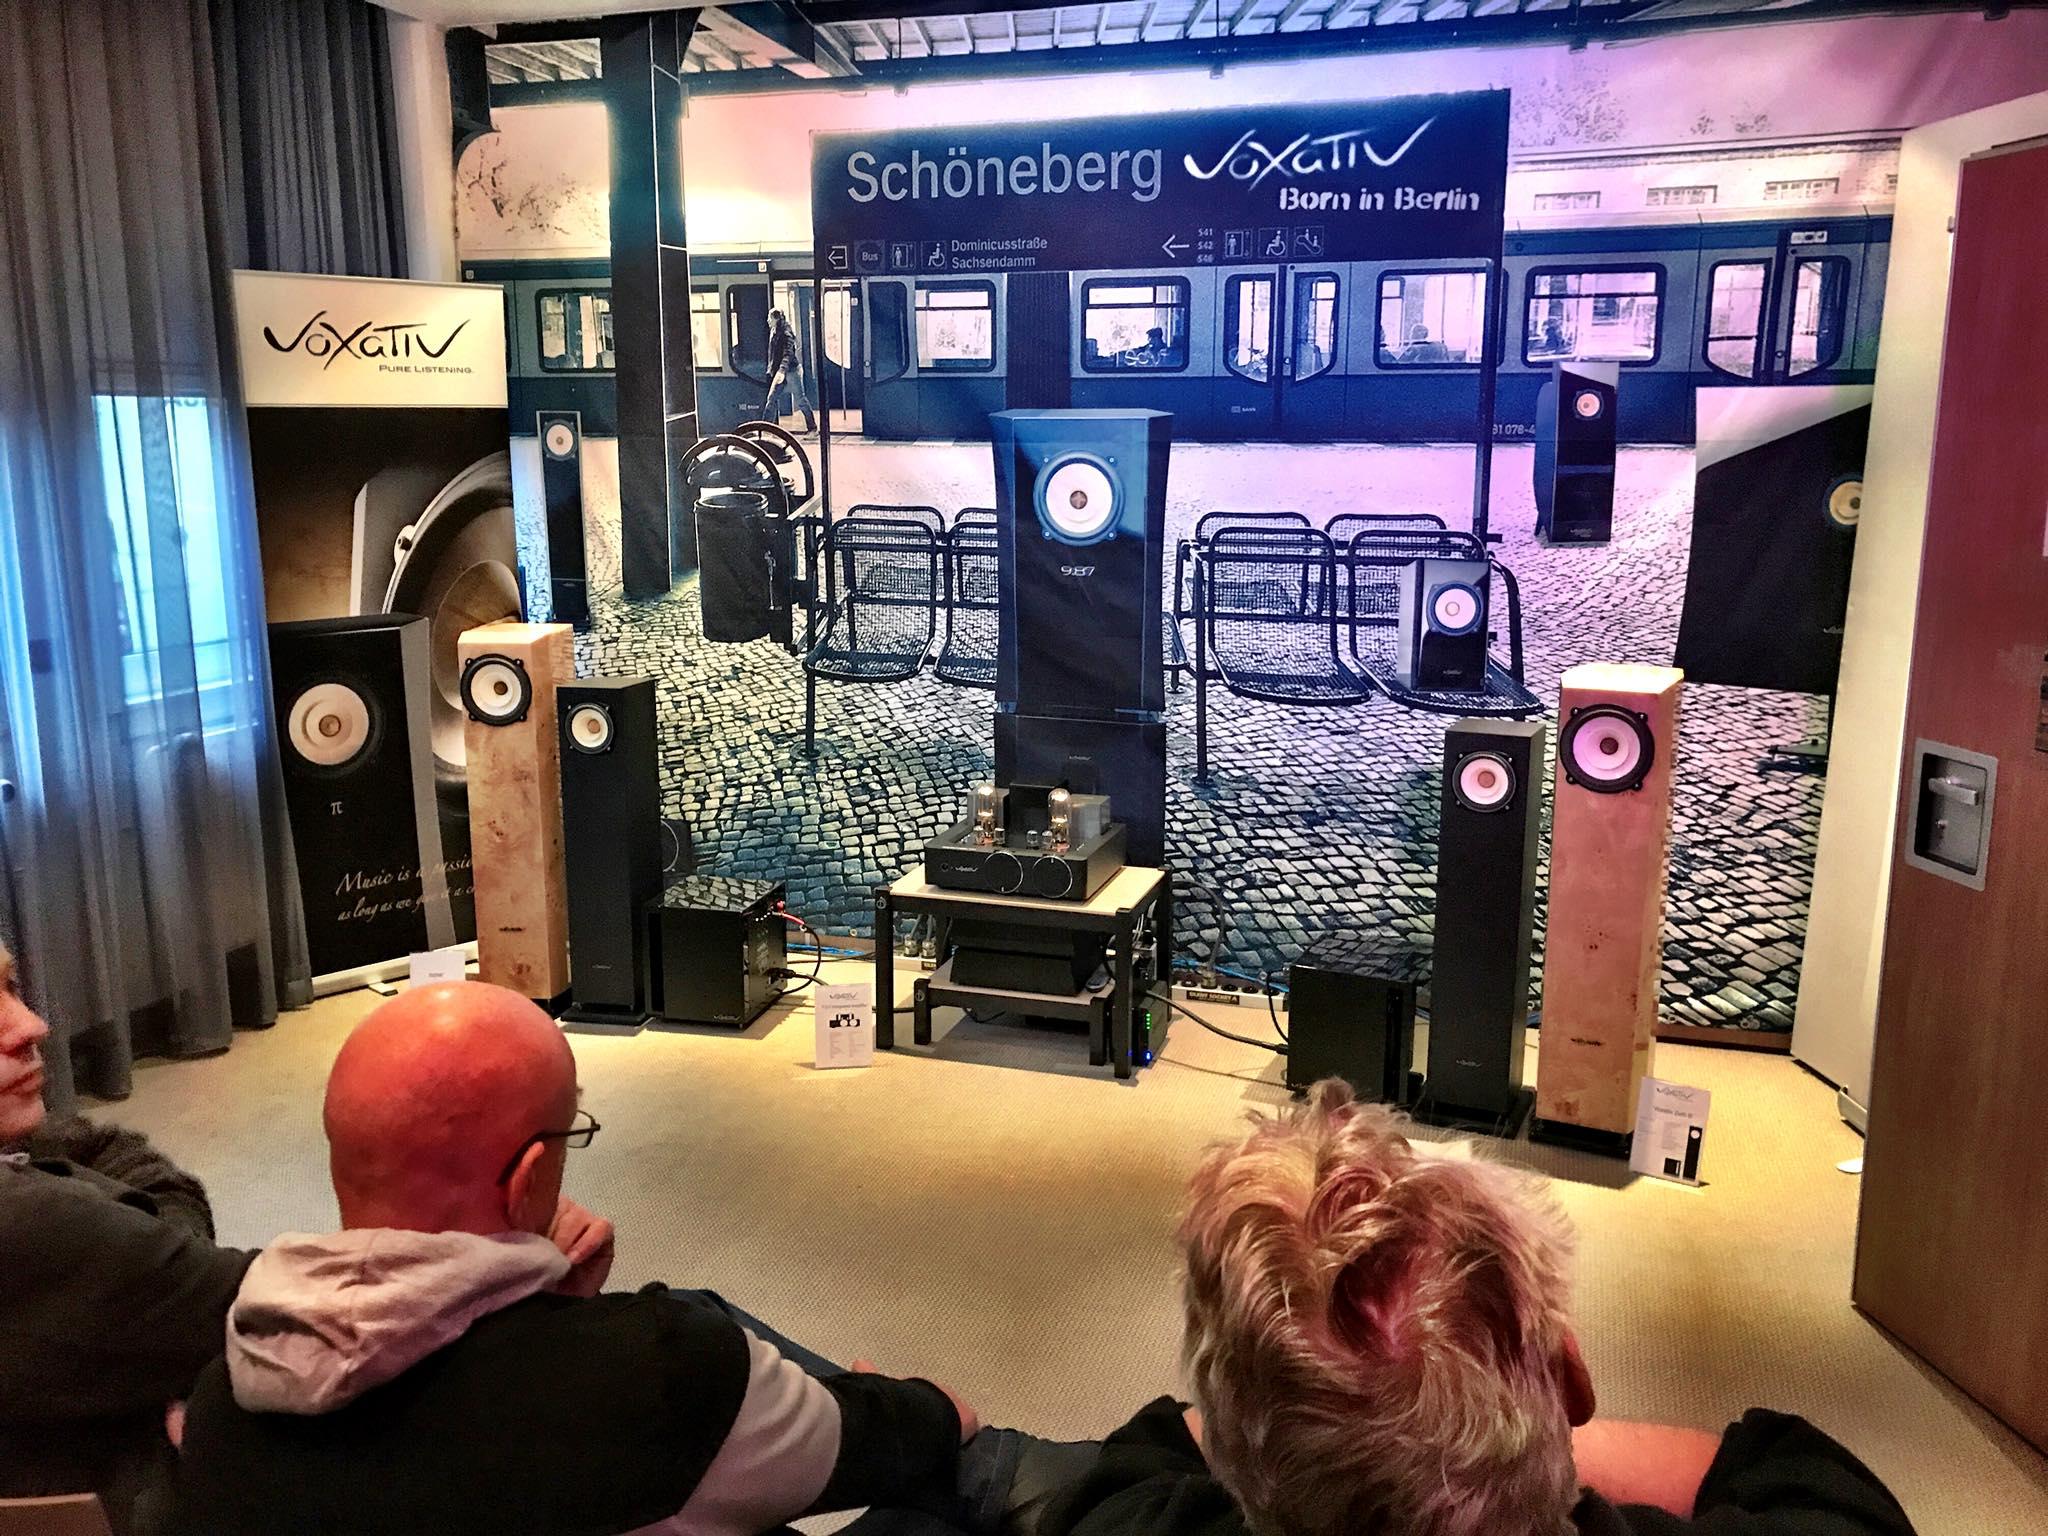 The most accessible Voxativ loudspeaker on the market. - Debuted in Stockholm at the High End Mässan 2019.